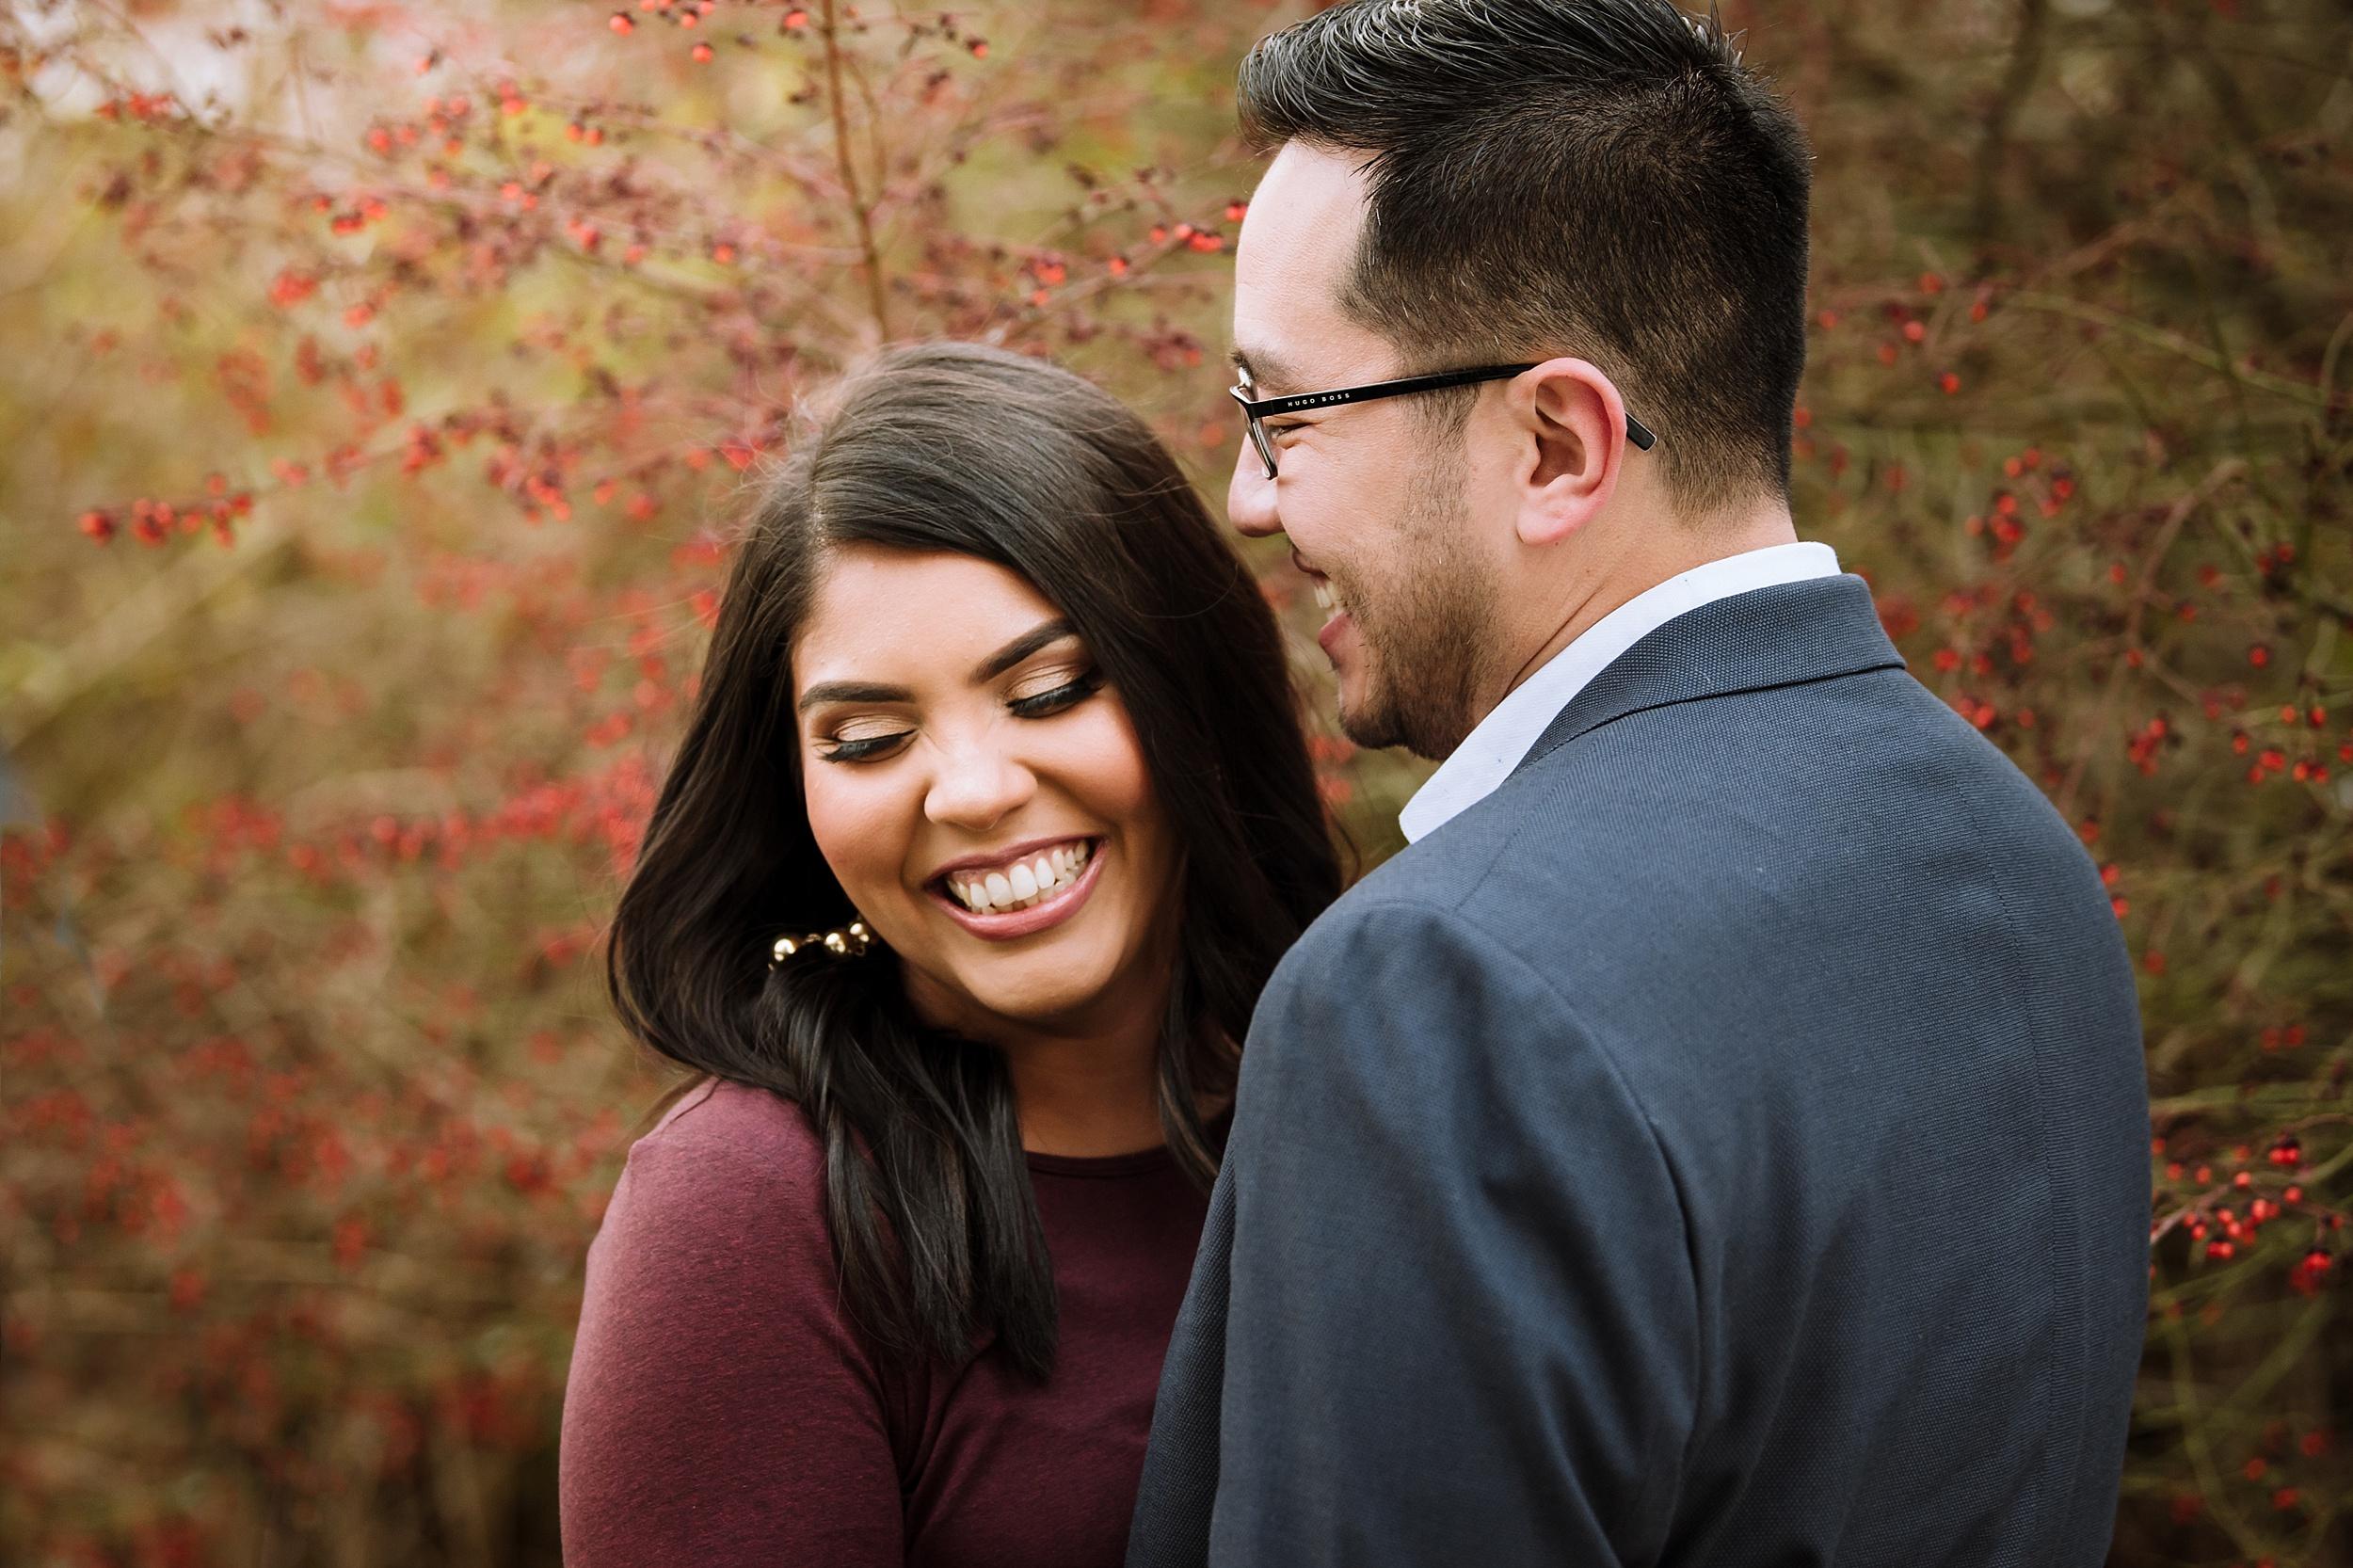 Alexander_Muir_Memorial_Gardens_Engagement_Shoot_Toronto_Wedding_Photographer_0012.jpg